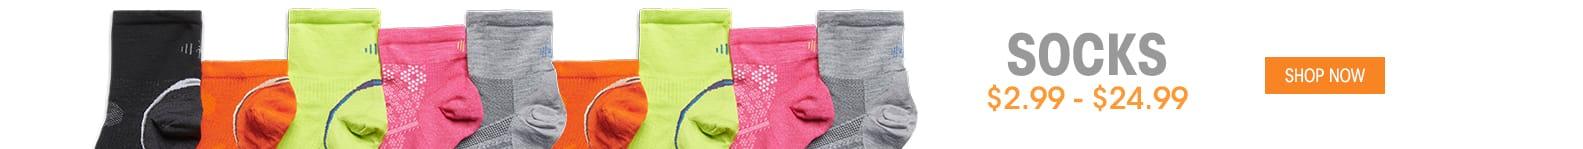 Socks - $2.99 - $24.99